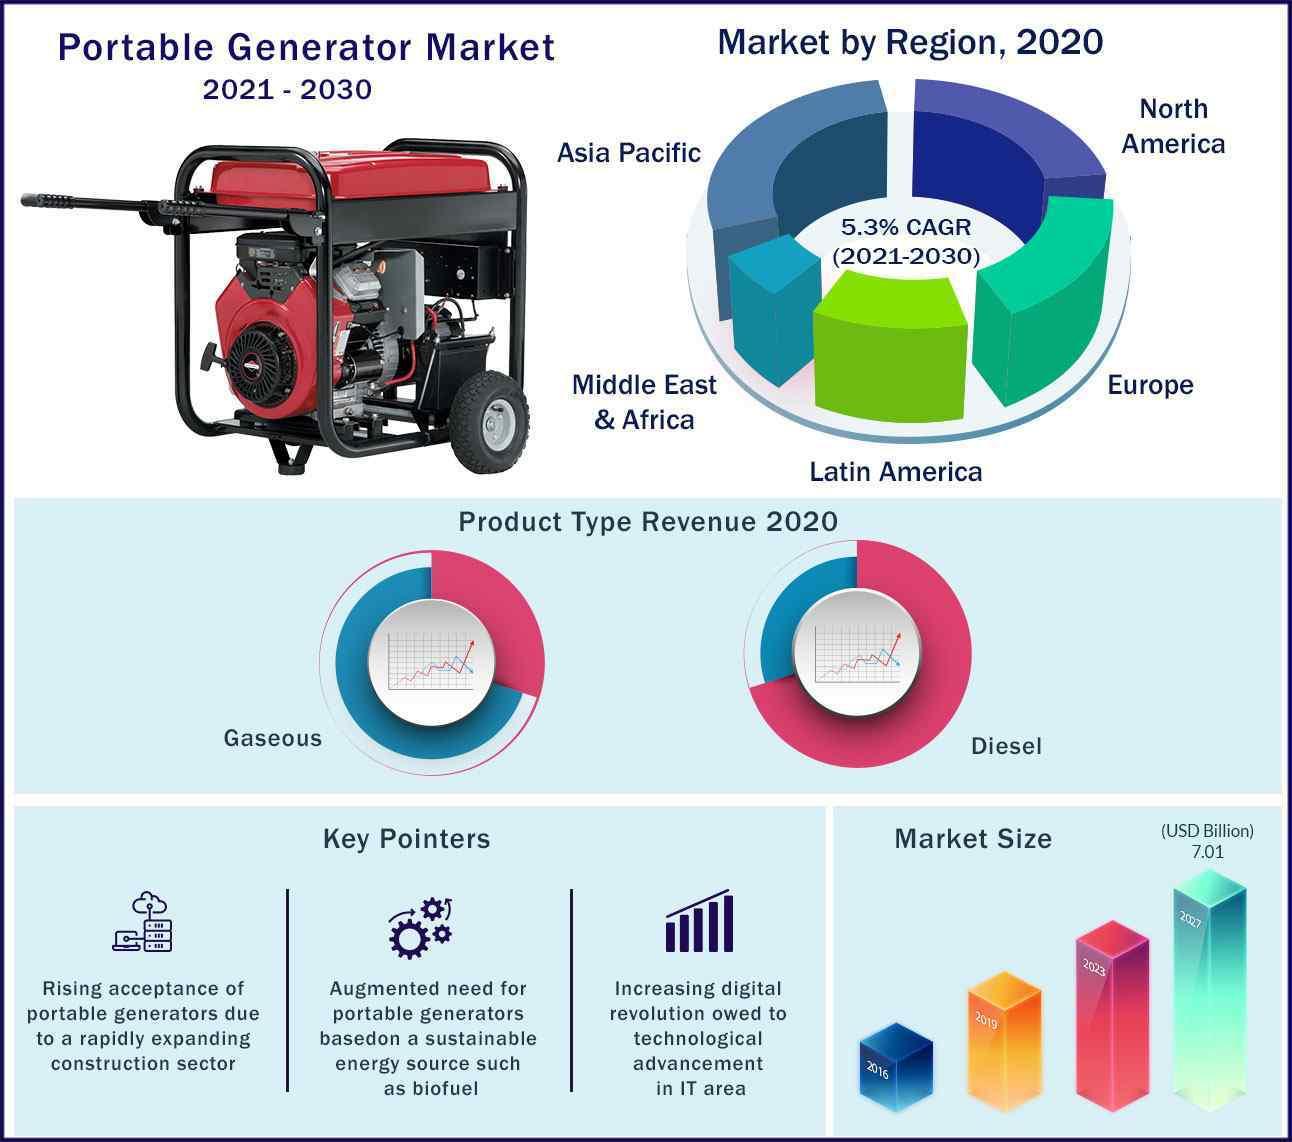 Global Portable Generator Market 2021 to 2030